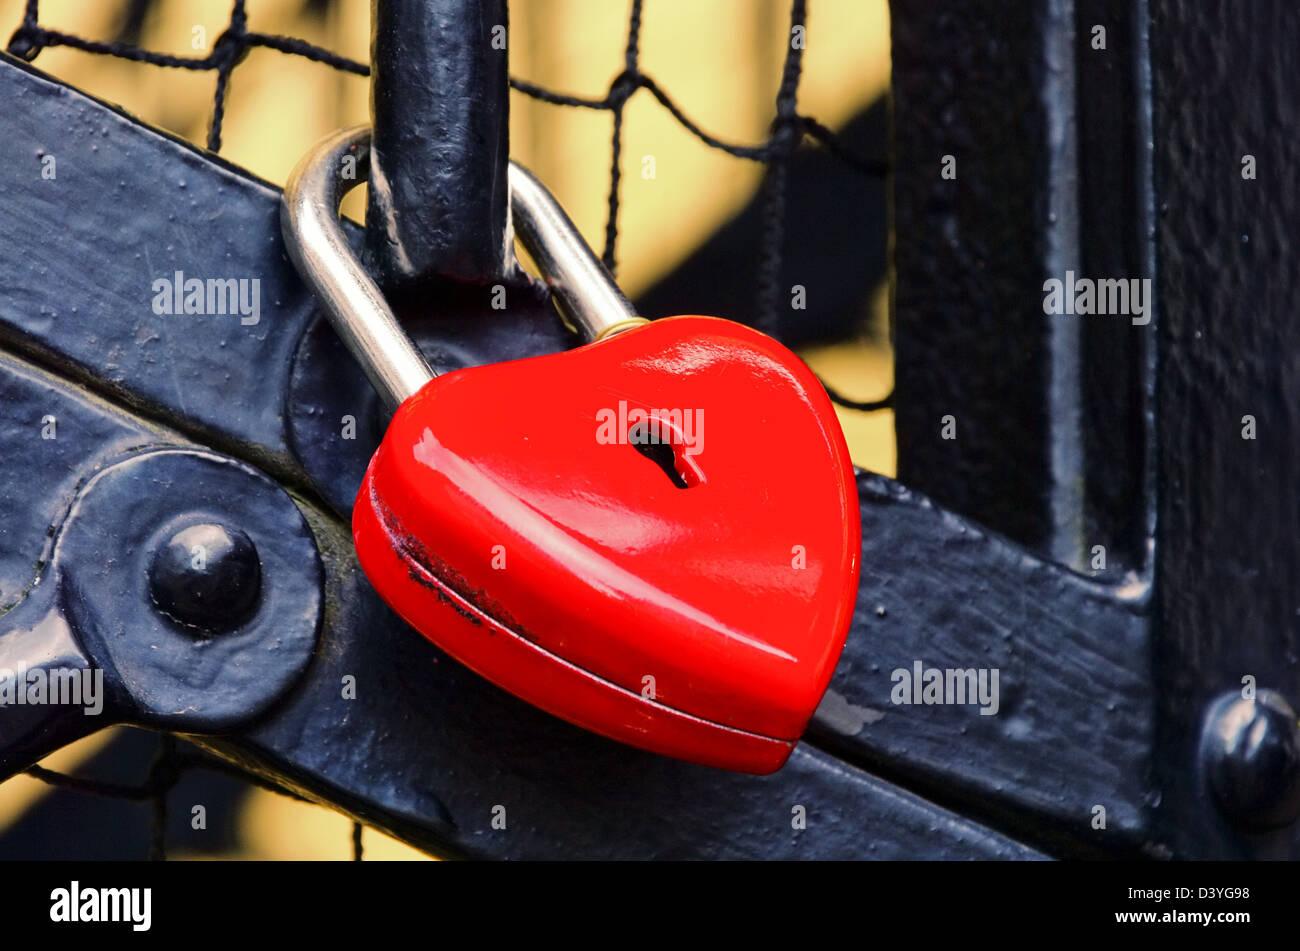 Schloss als Herz - padlock heart 01 - Stock Image